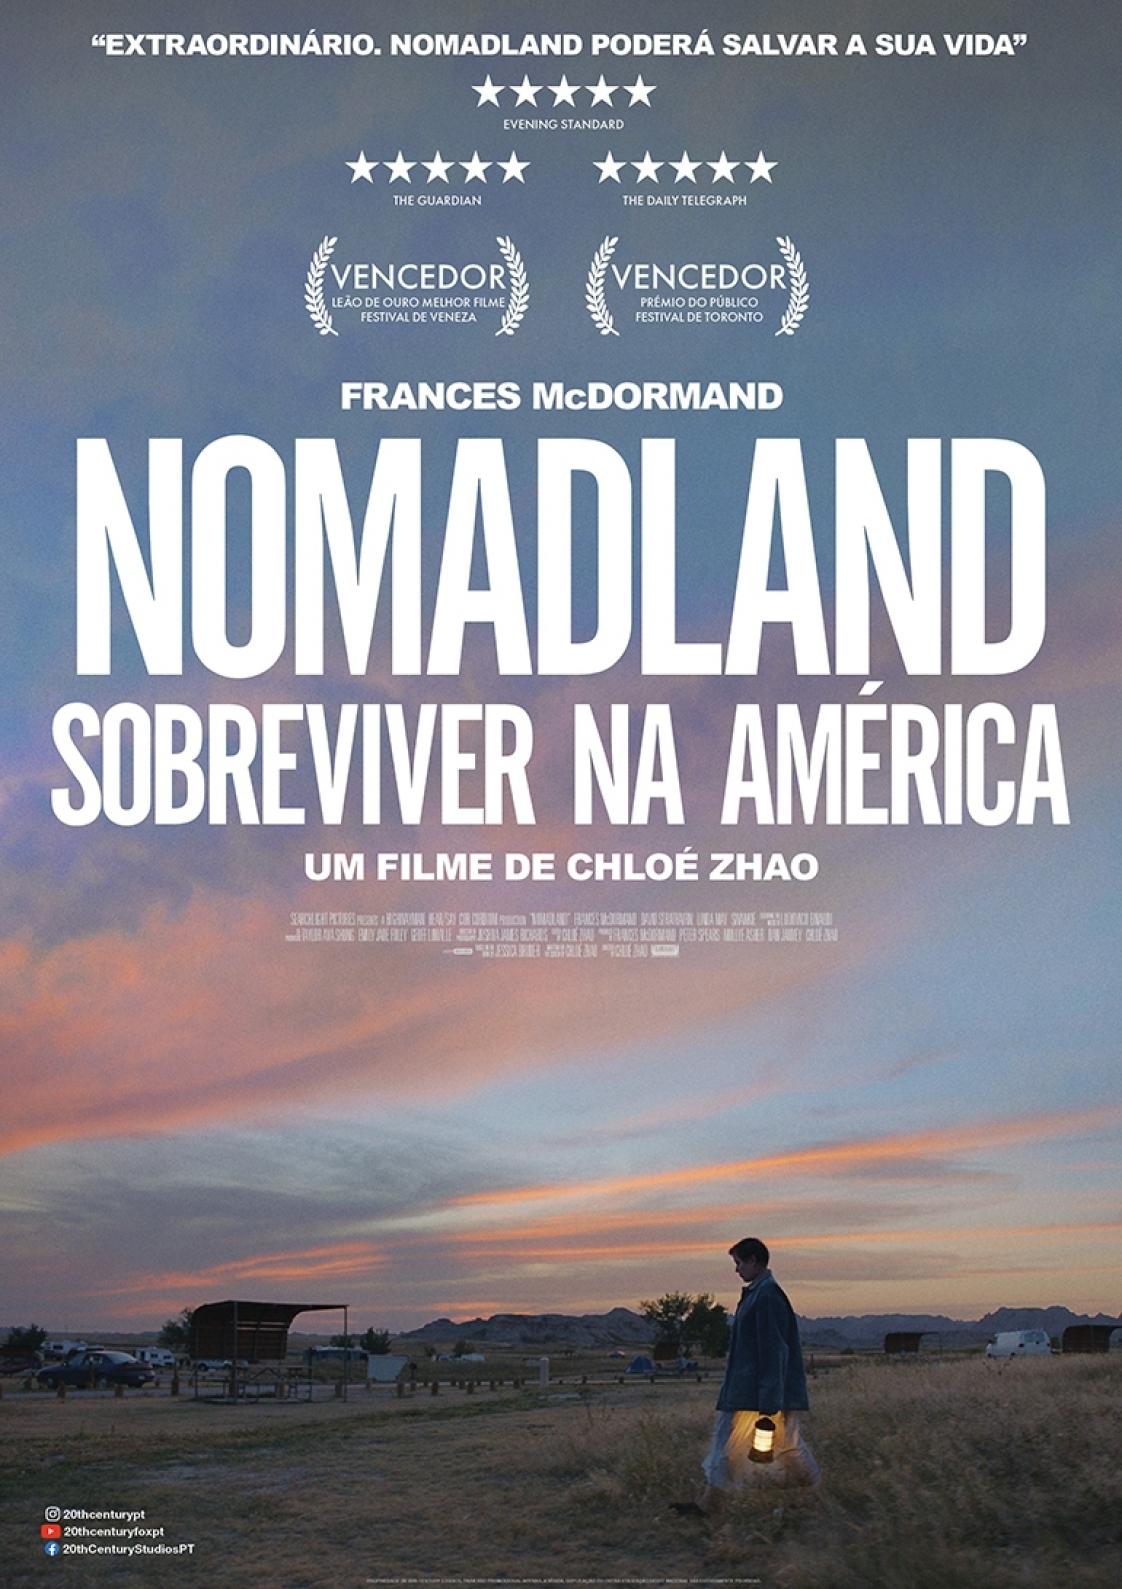 NOMADLAND – Sobreviver na América